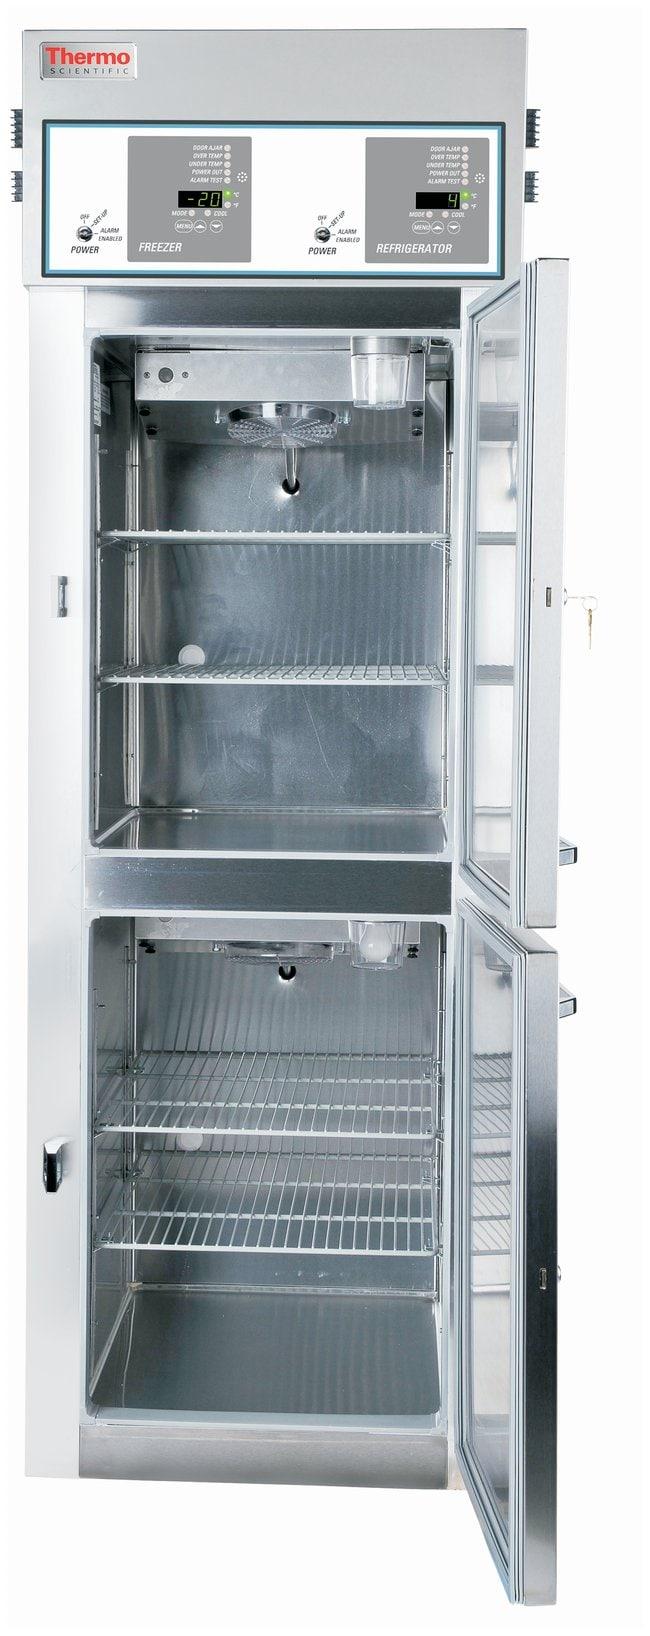 Lab Refrigerator-Freezer Combinations Catalog and Freezers ...